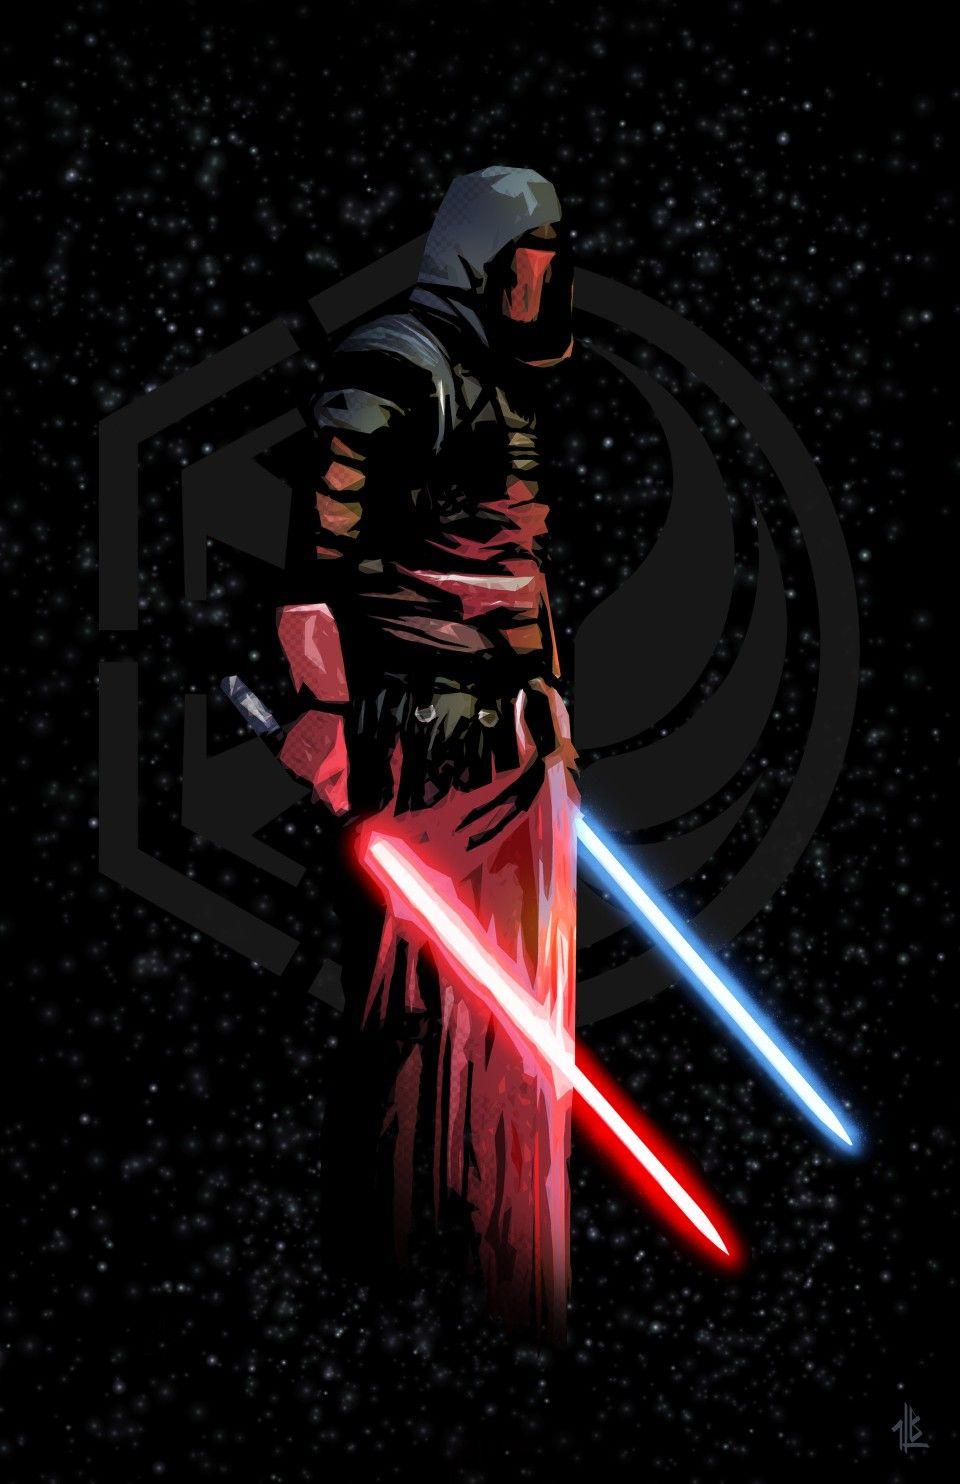 Darth Revan Star wars pictures, Star wars images, Star